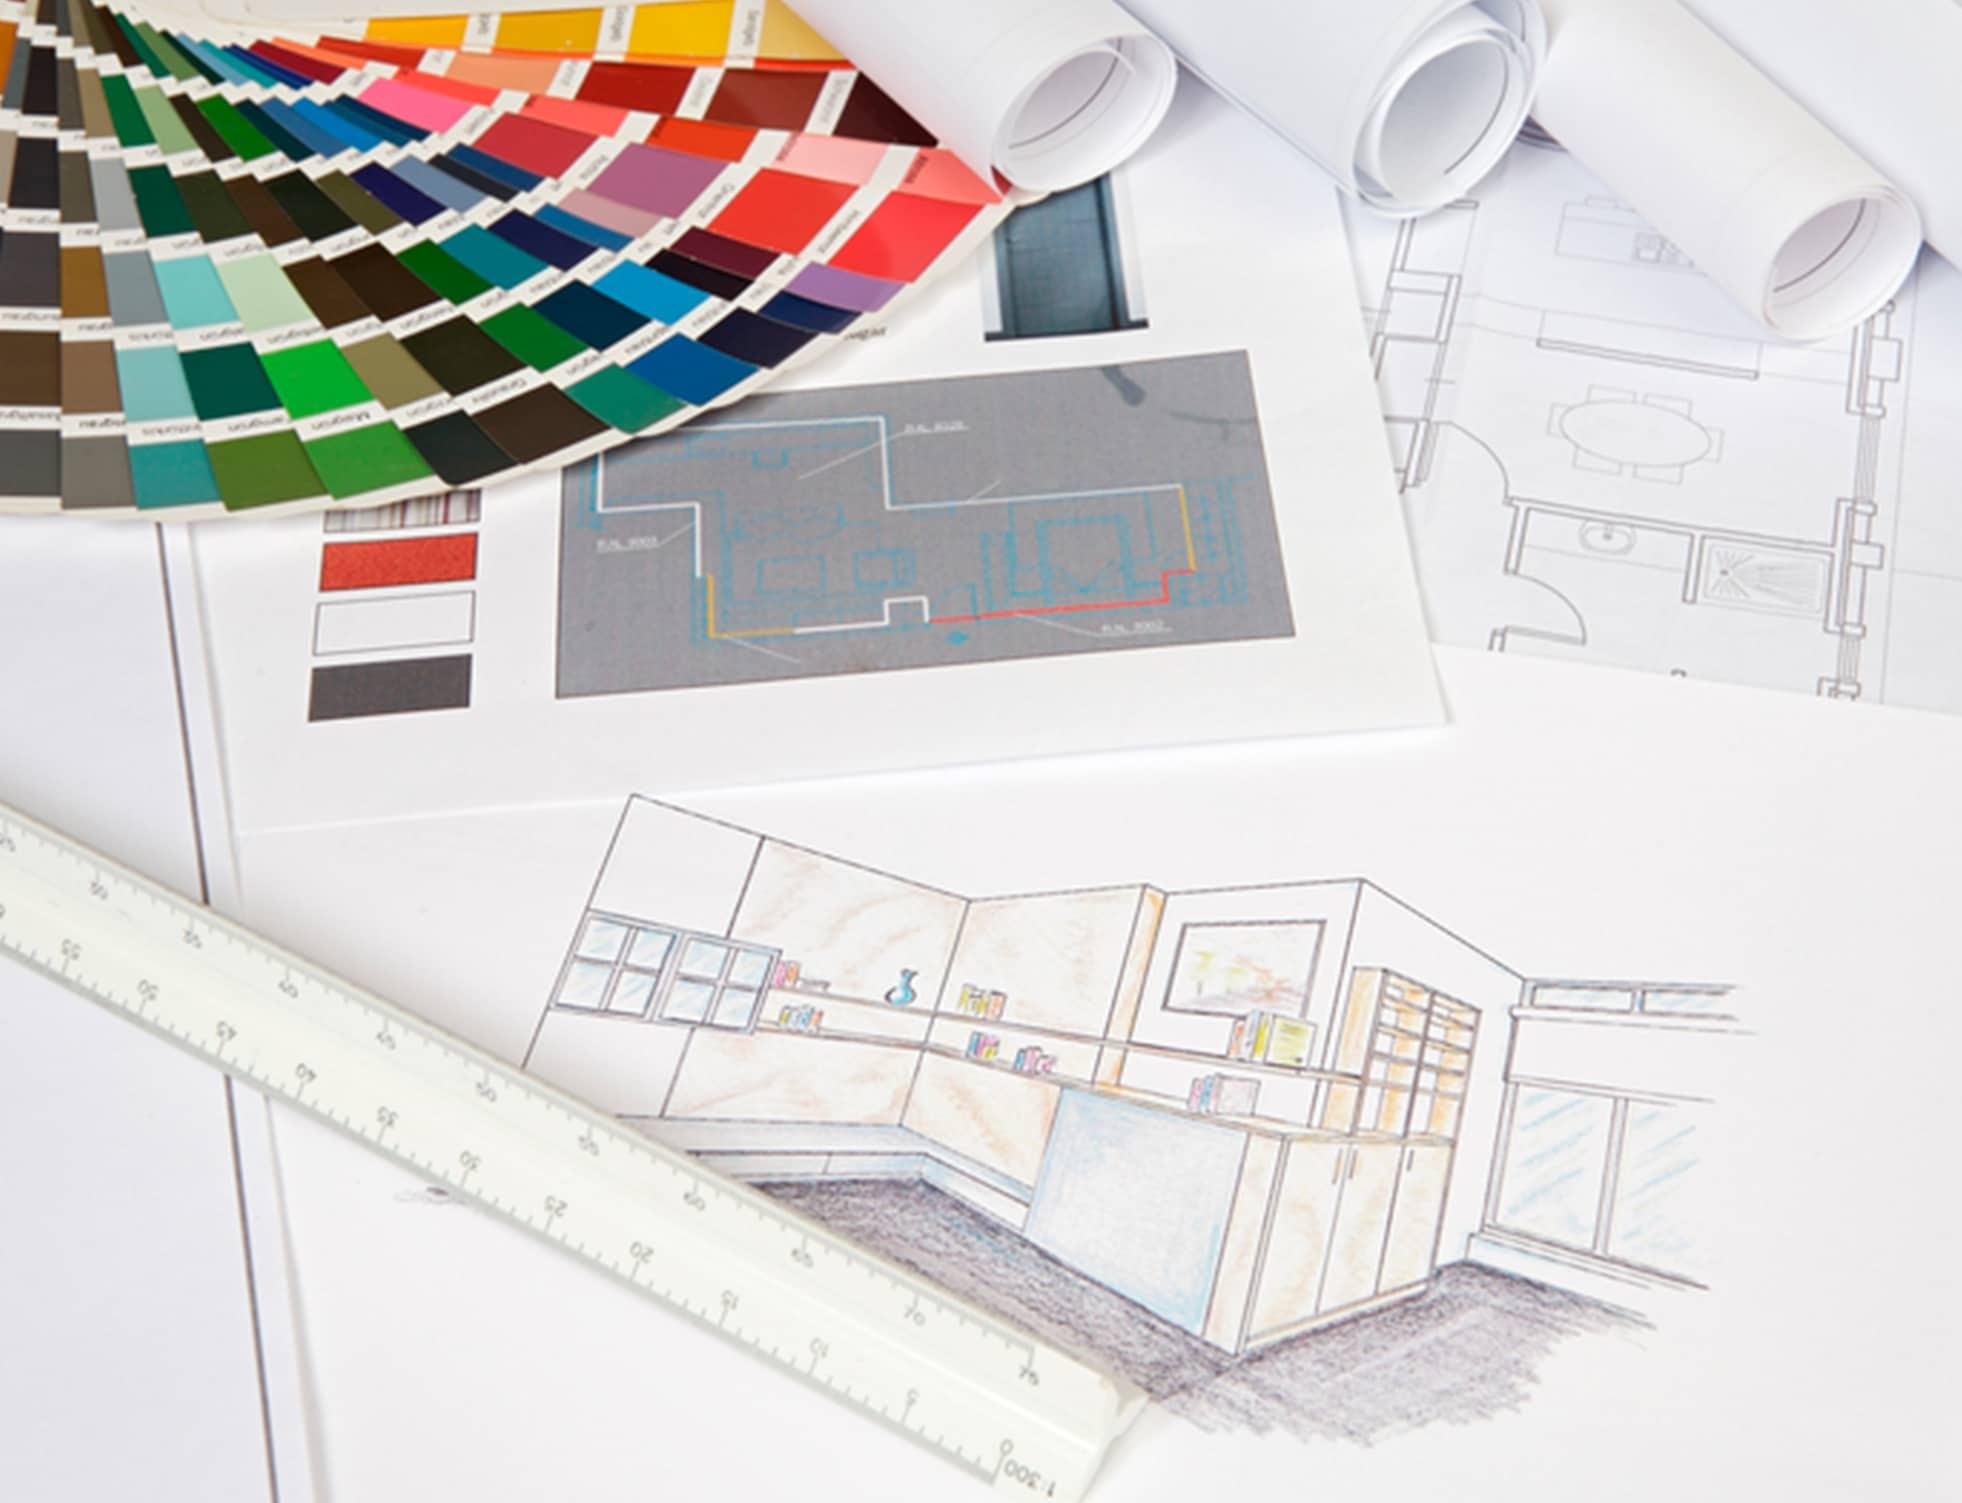 proyectos-rquitectonicos